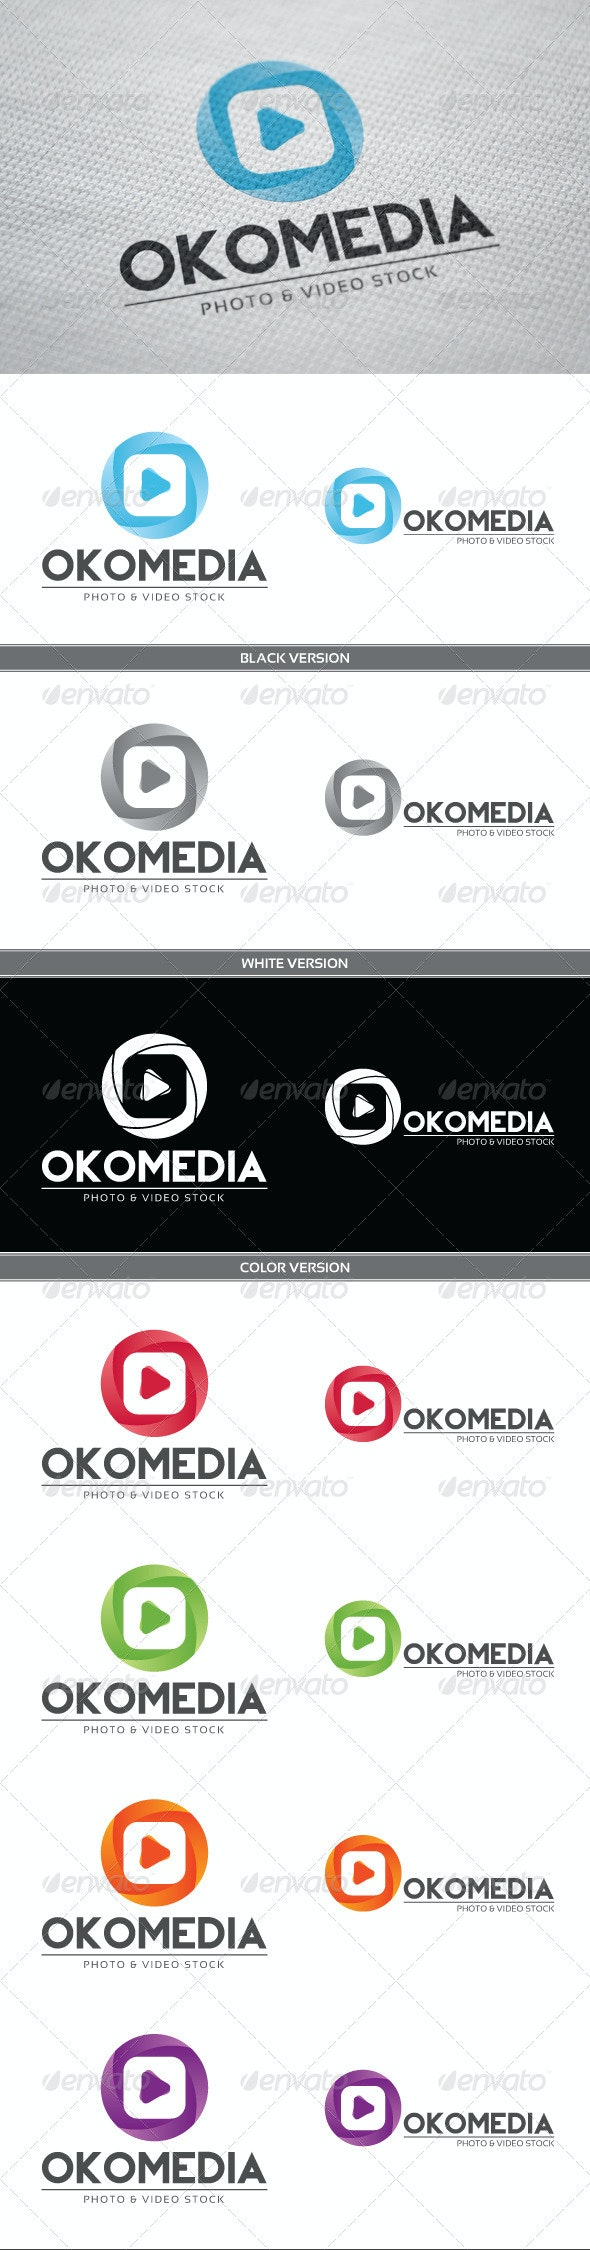 Okomedia Logo - Vector Abstract